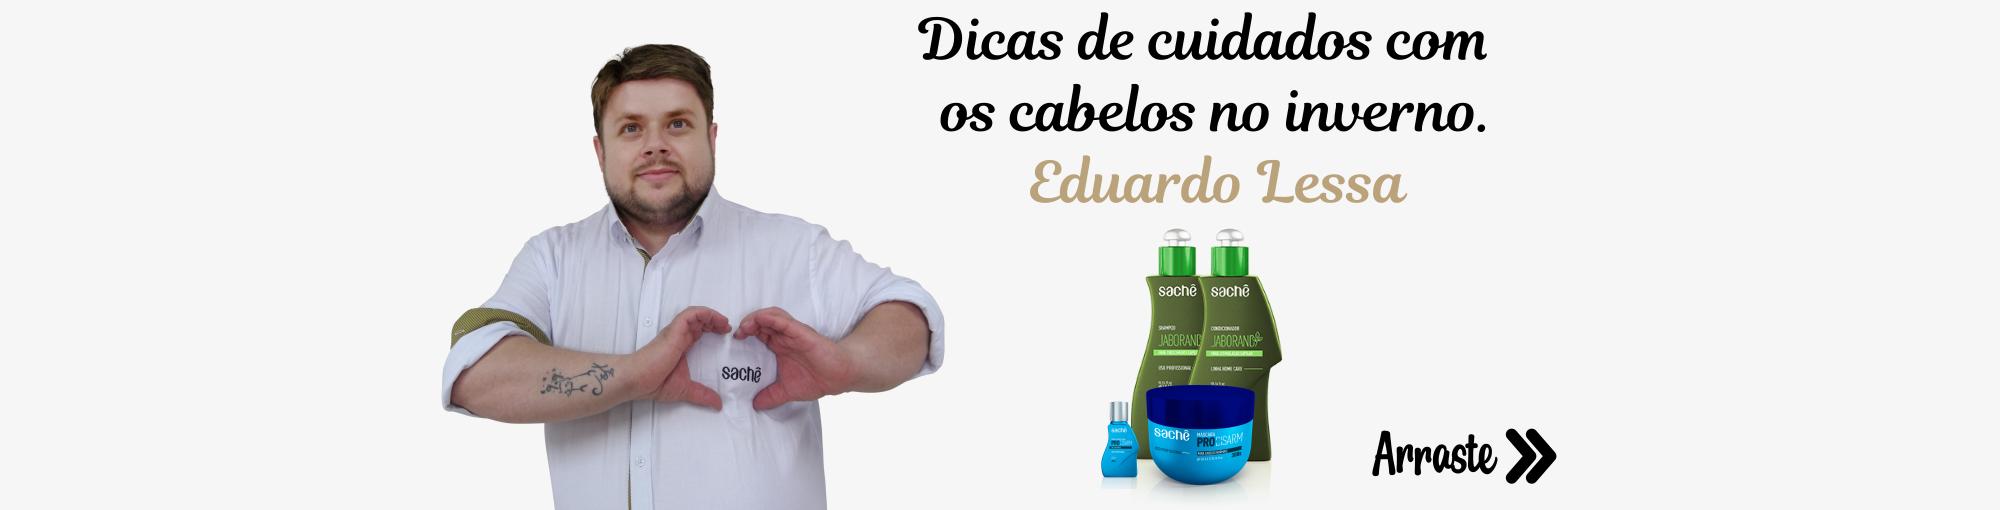 Kit Eduardo Lessa